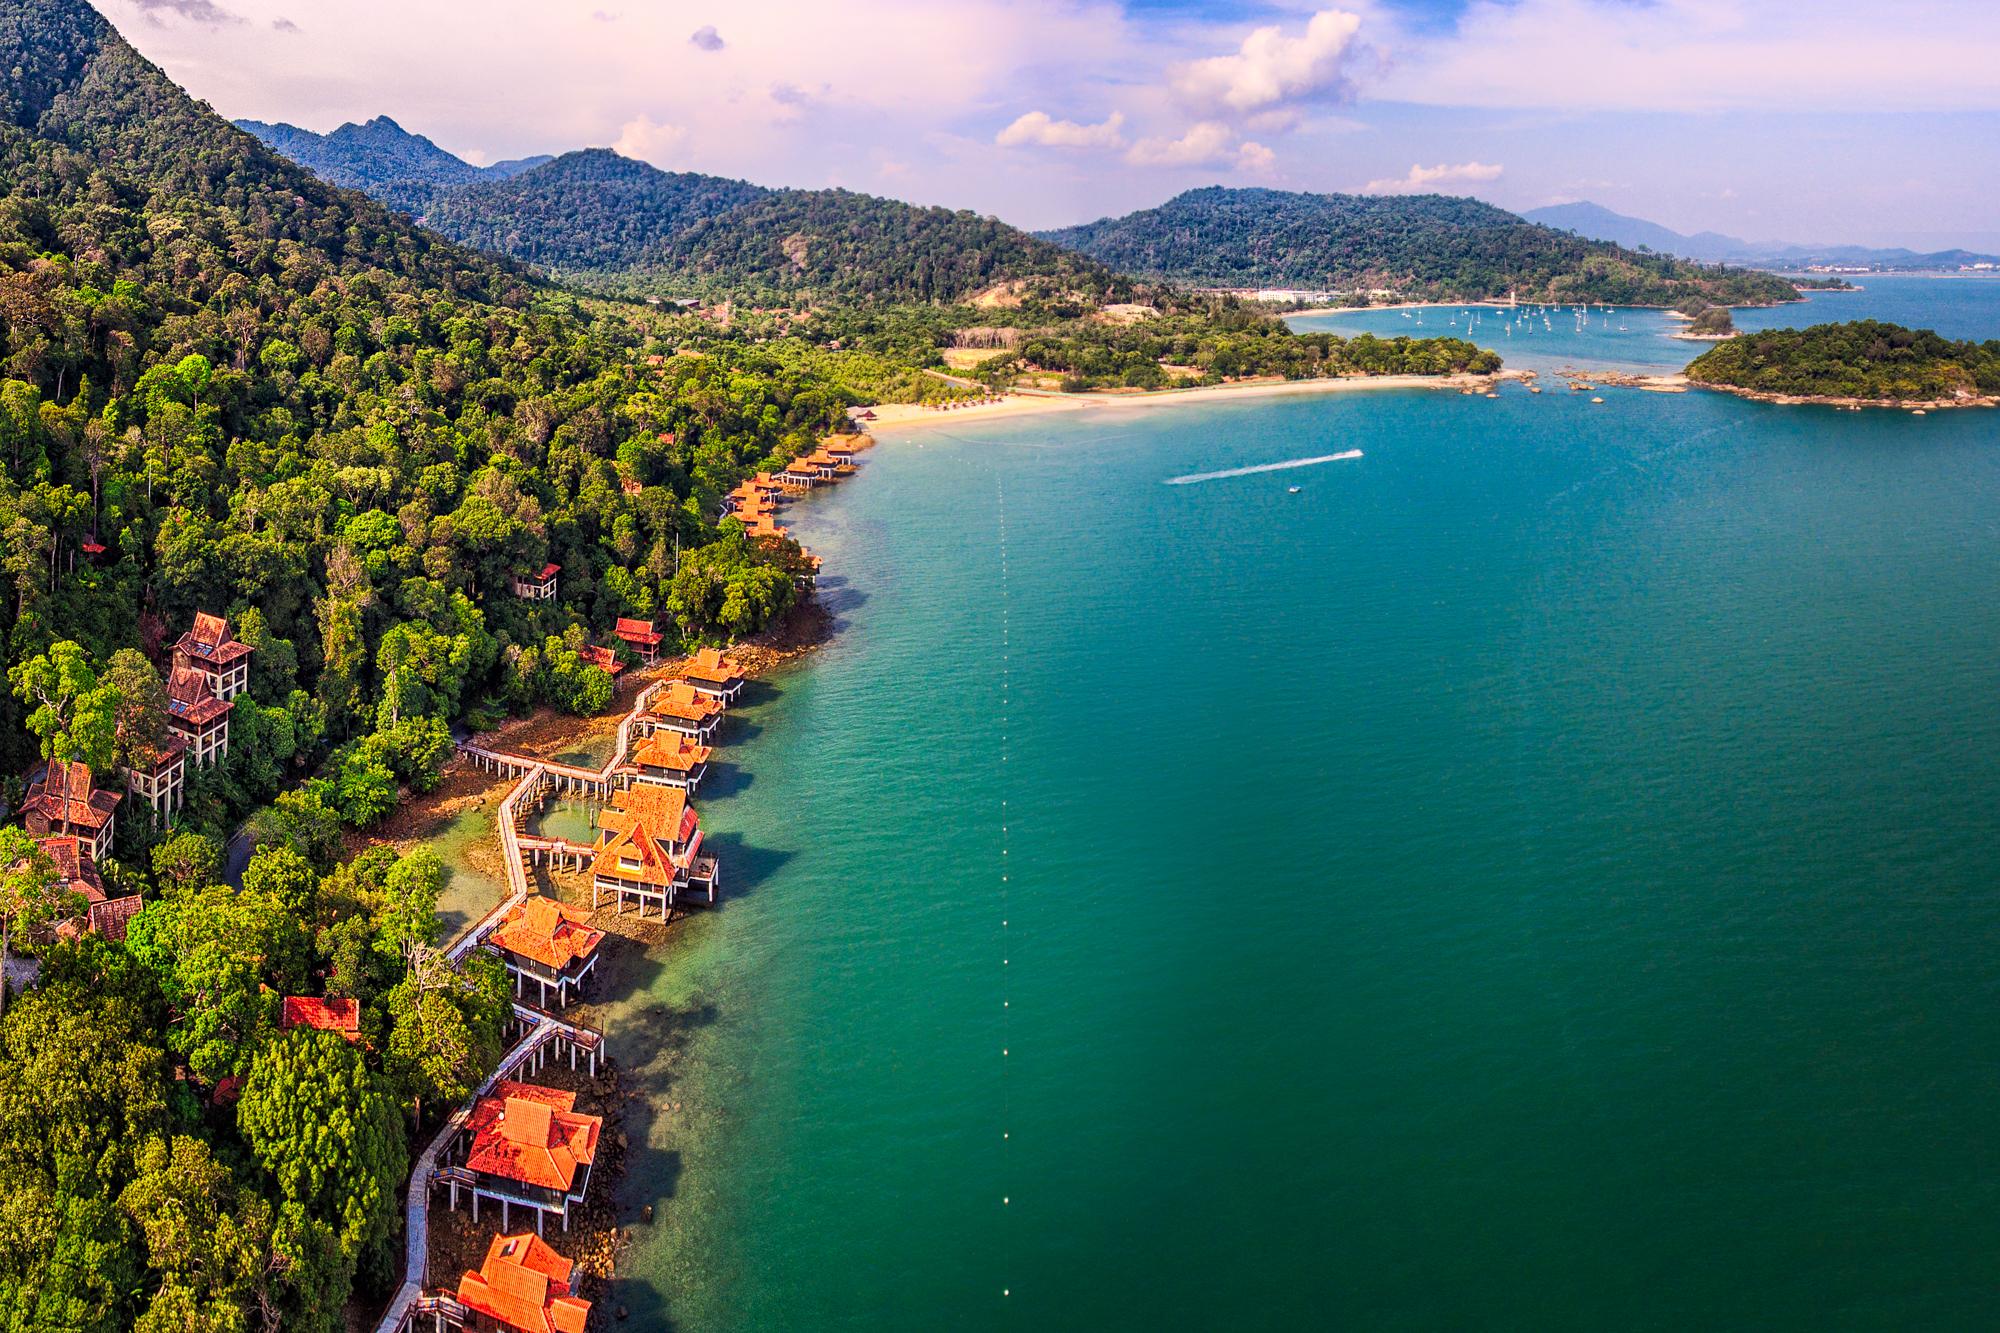 Elevation of Pantai Cenang, Langkawi, Kedah, Malaysia ...